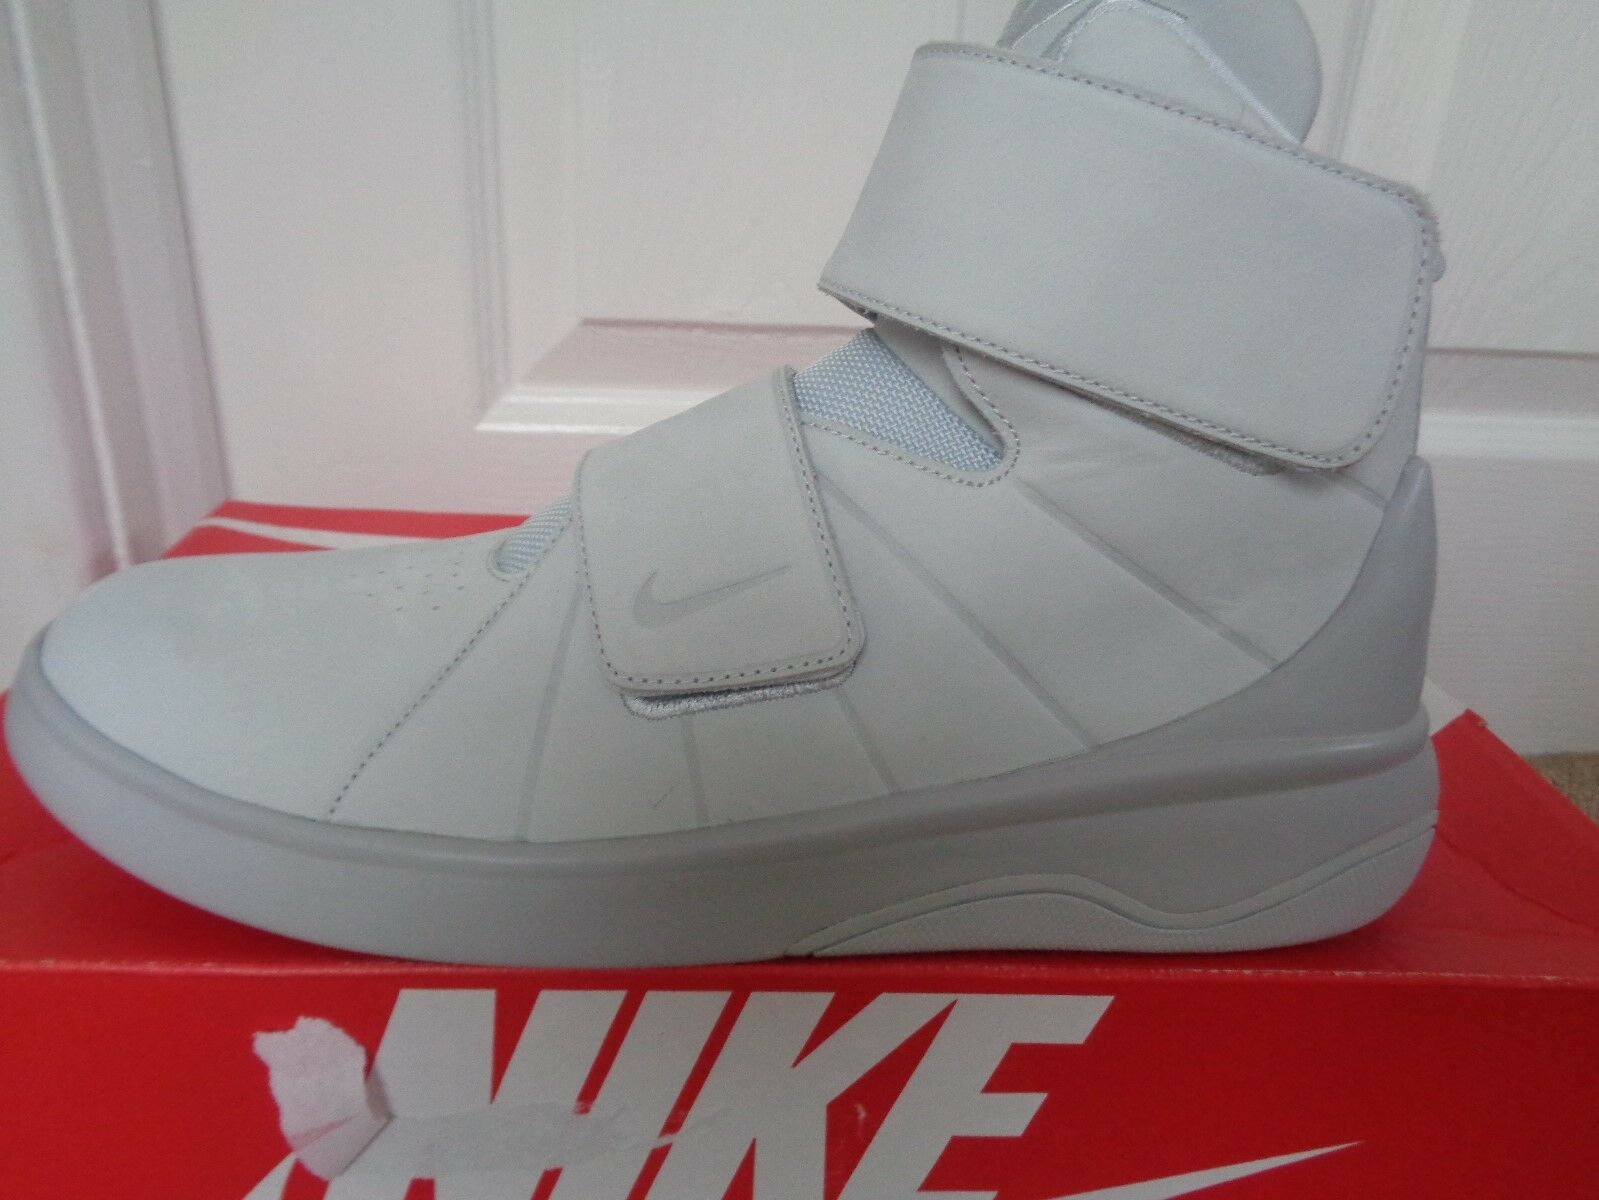 Nike Marxman PRM mens TurnschuheStiefel schuhe 832766 001 uk 7 eu 41 us 8 NEW+BOX